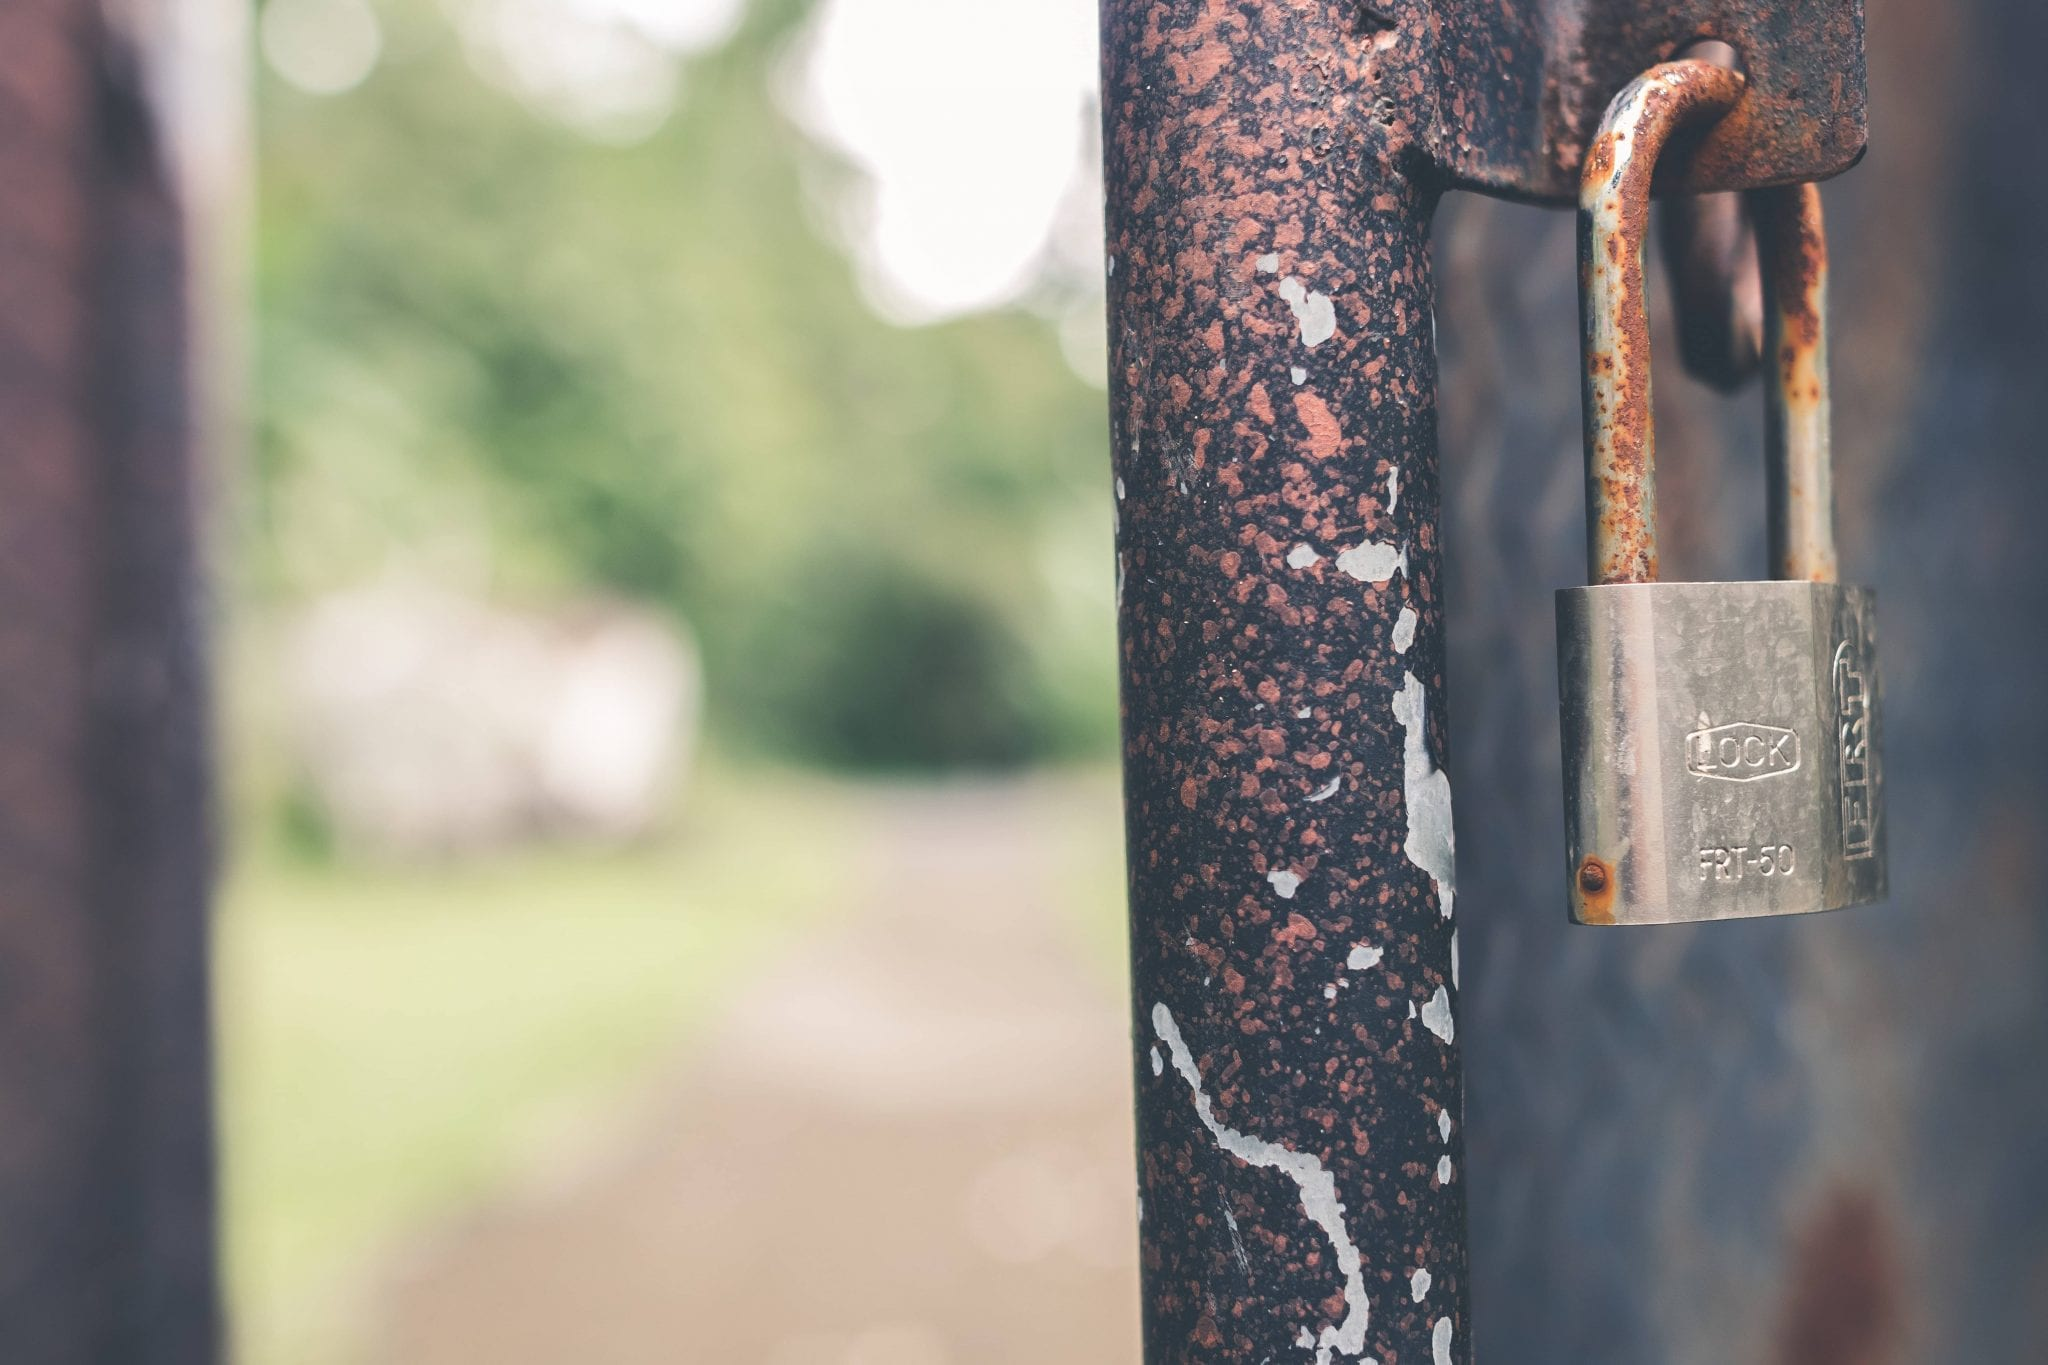 Squats immobiliers : quels changements de la loi ?